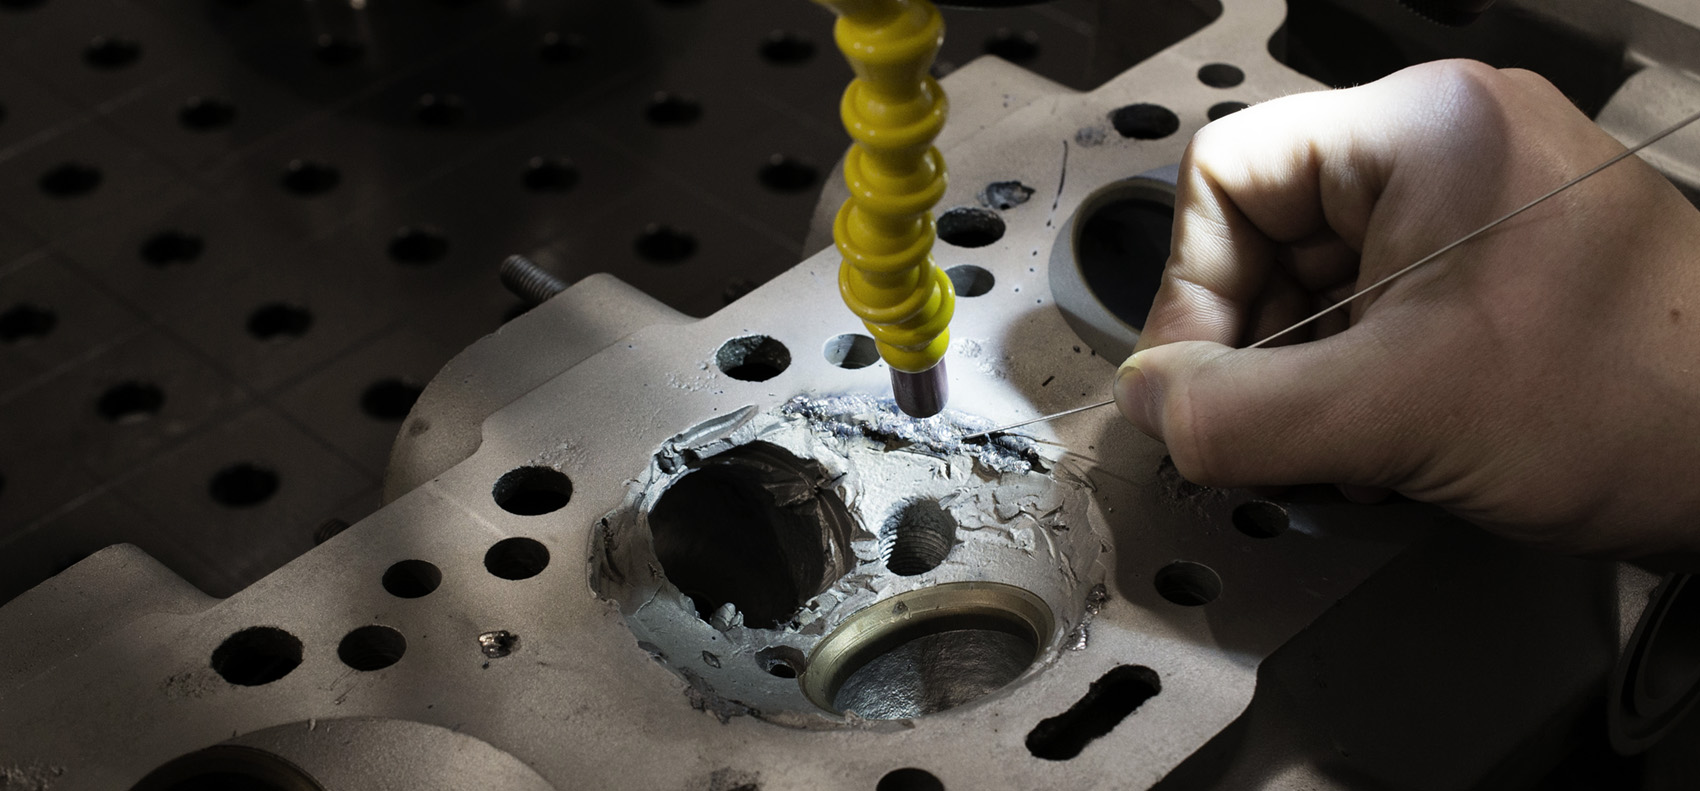 saldatura laser per la riparazione di una testa motore